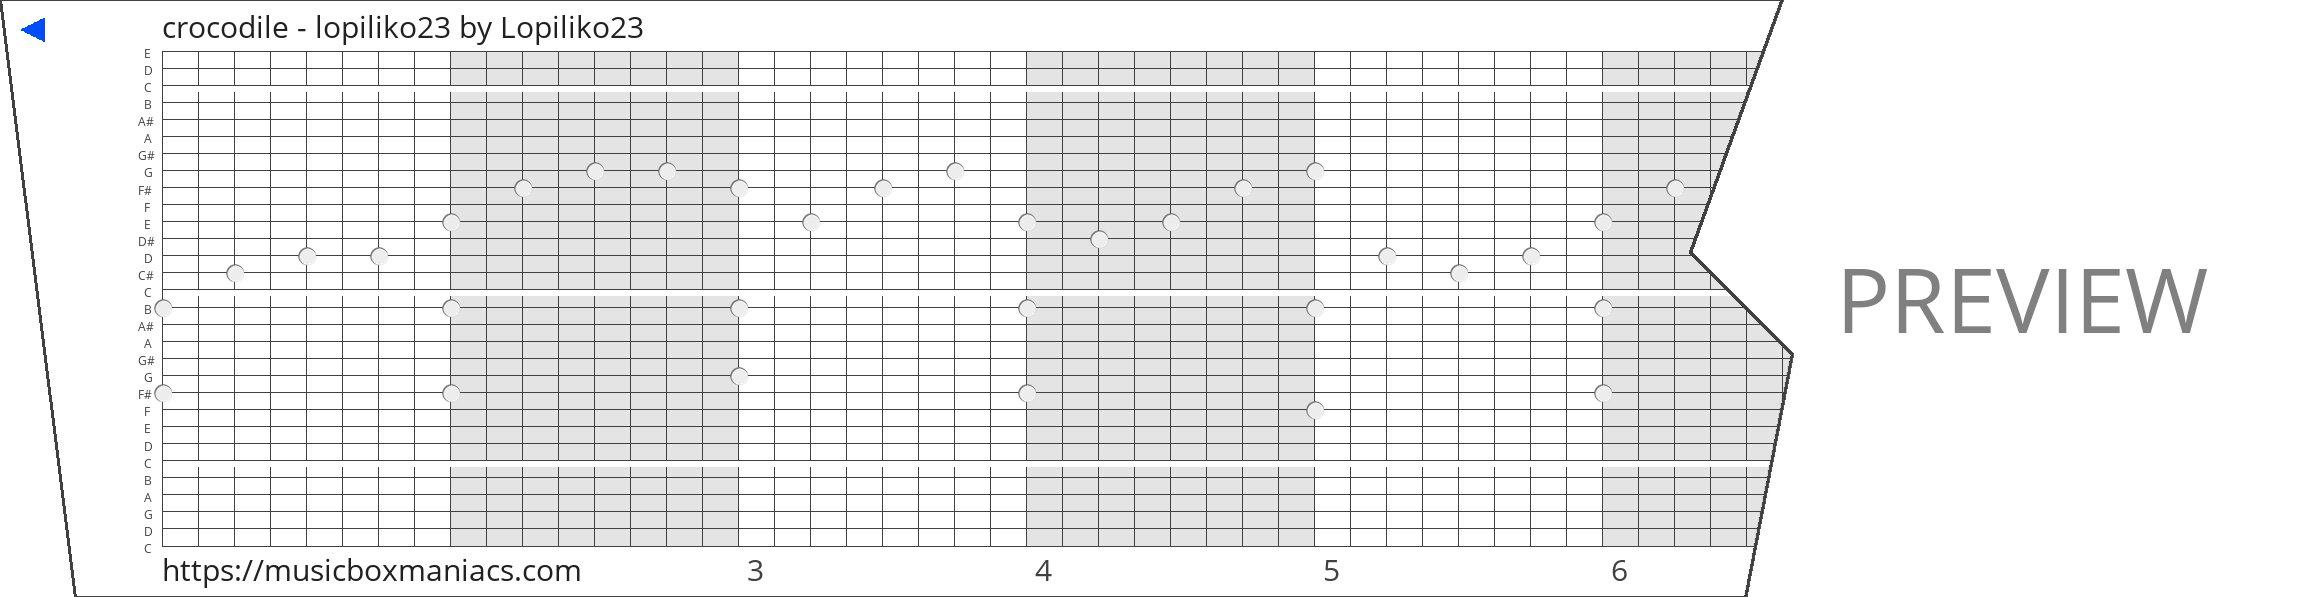 crocodile - lopiliko23 30 note music box paper strip